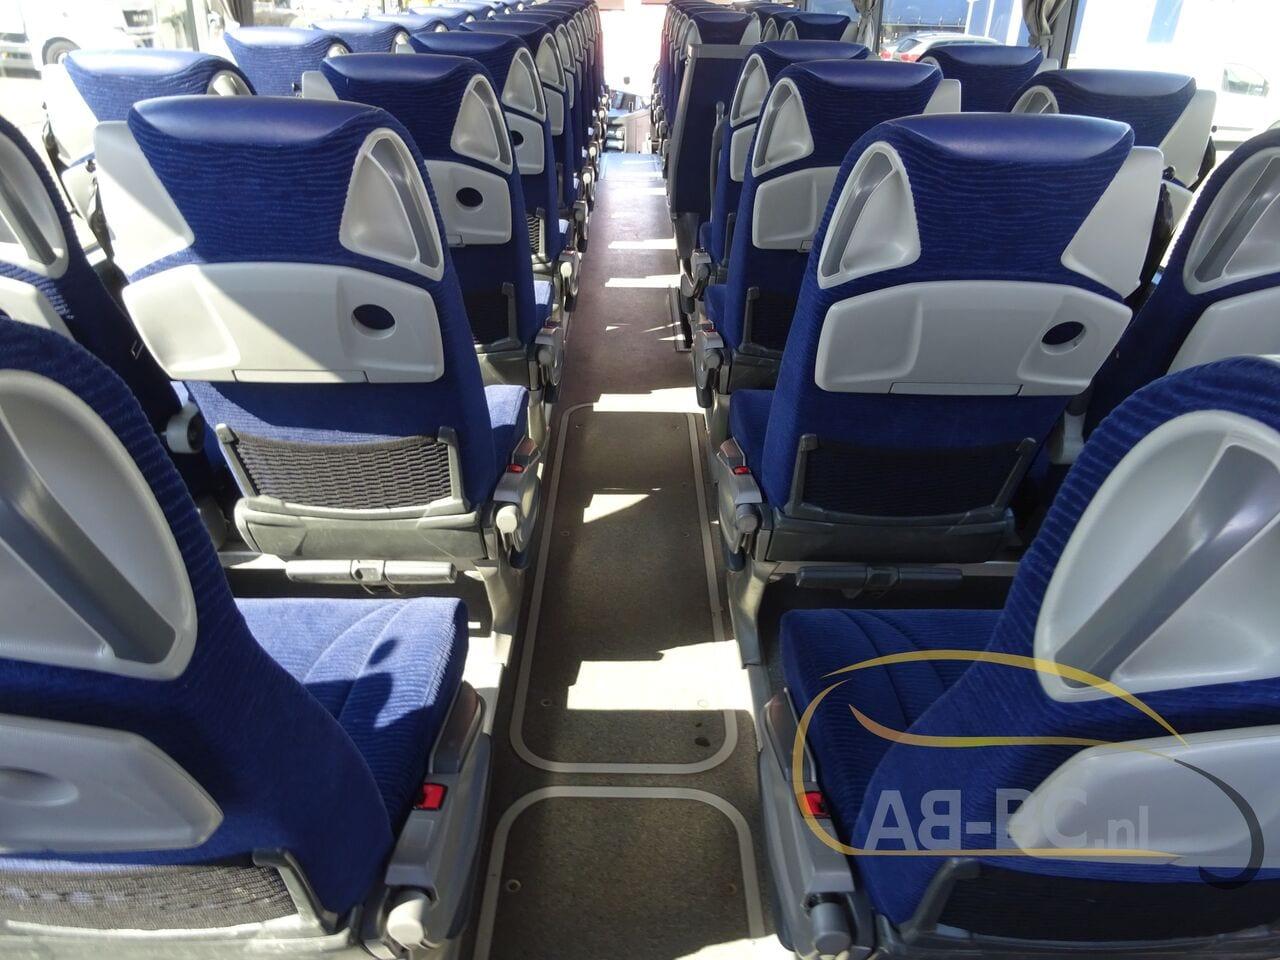 coach-busSETRA-S415-GT-HD-FINAL-EDITION-51-SEATS-LIFTBUS---1620382113689447415_big_c5aafe0b6e6c93ce8fe520db1120cbfd--21050713010665719300